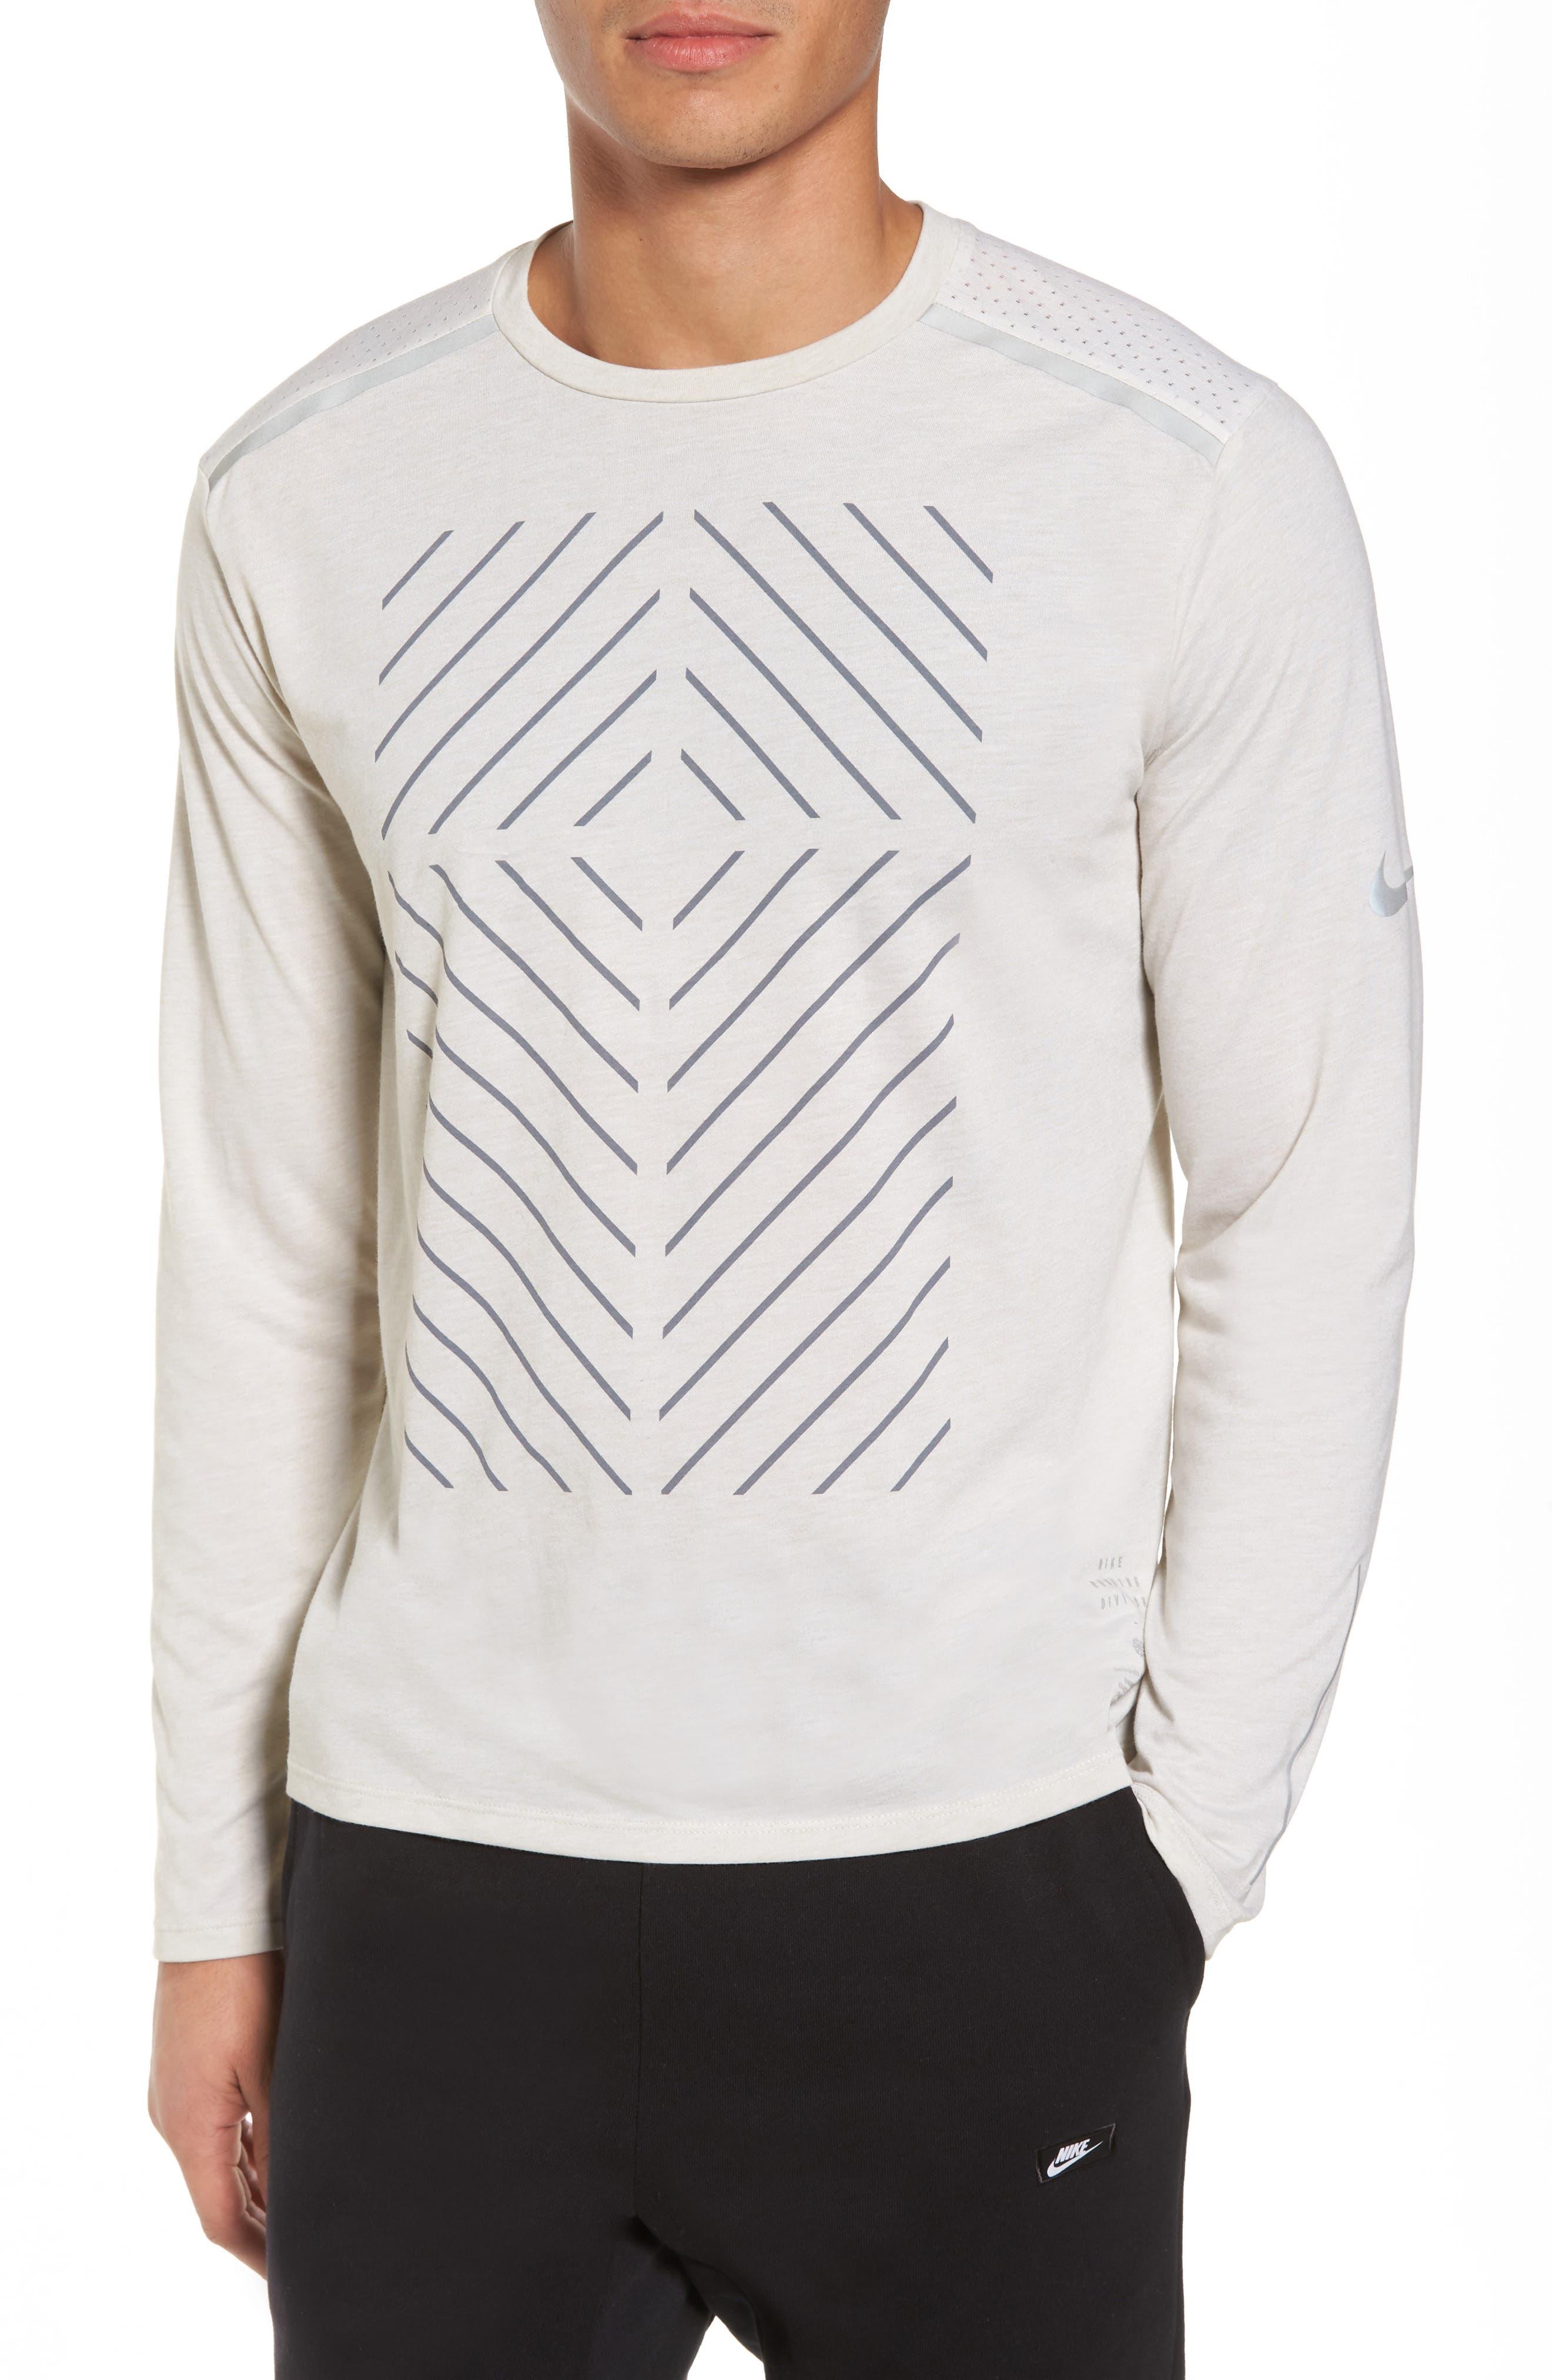 Tailwind Long Sleeve Running T-Shirt,                         Main,                         color, Light Bone/ Heather